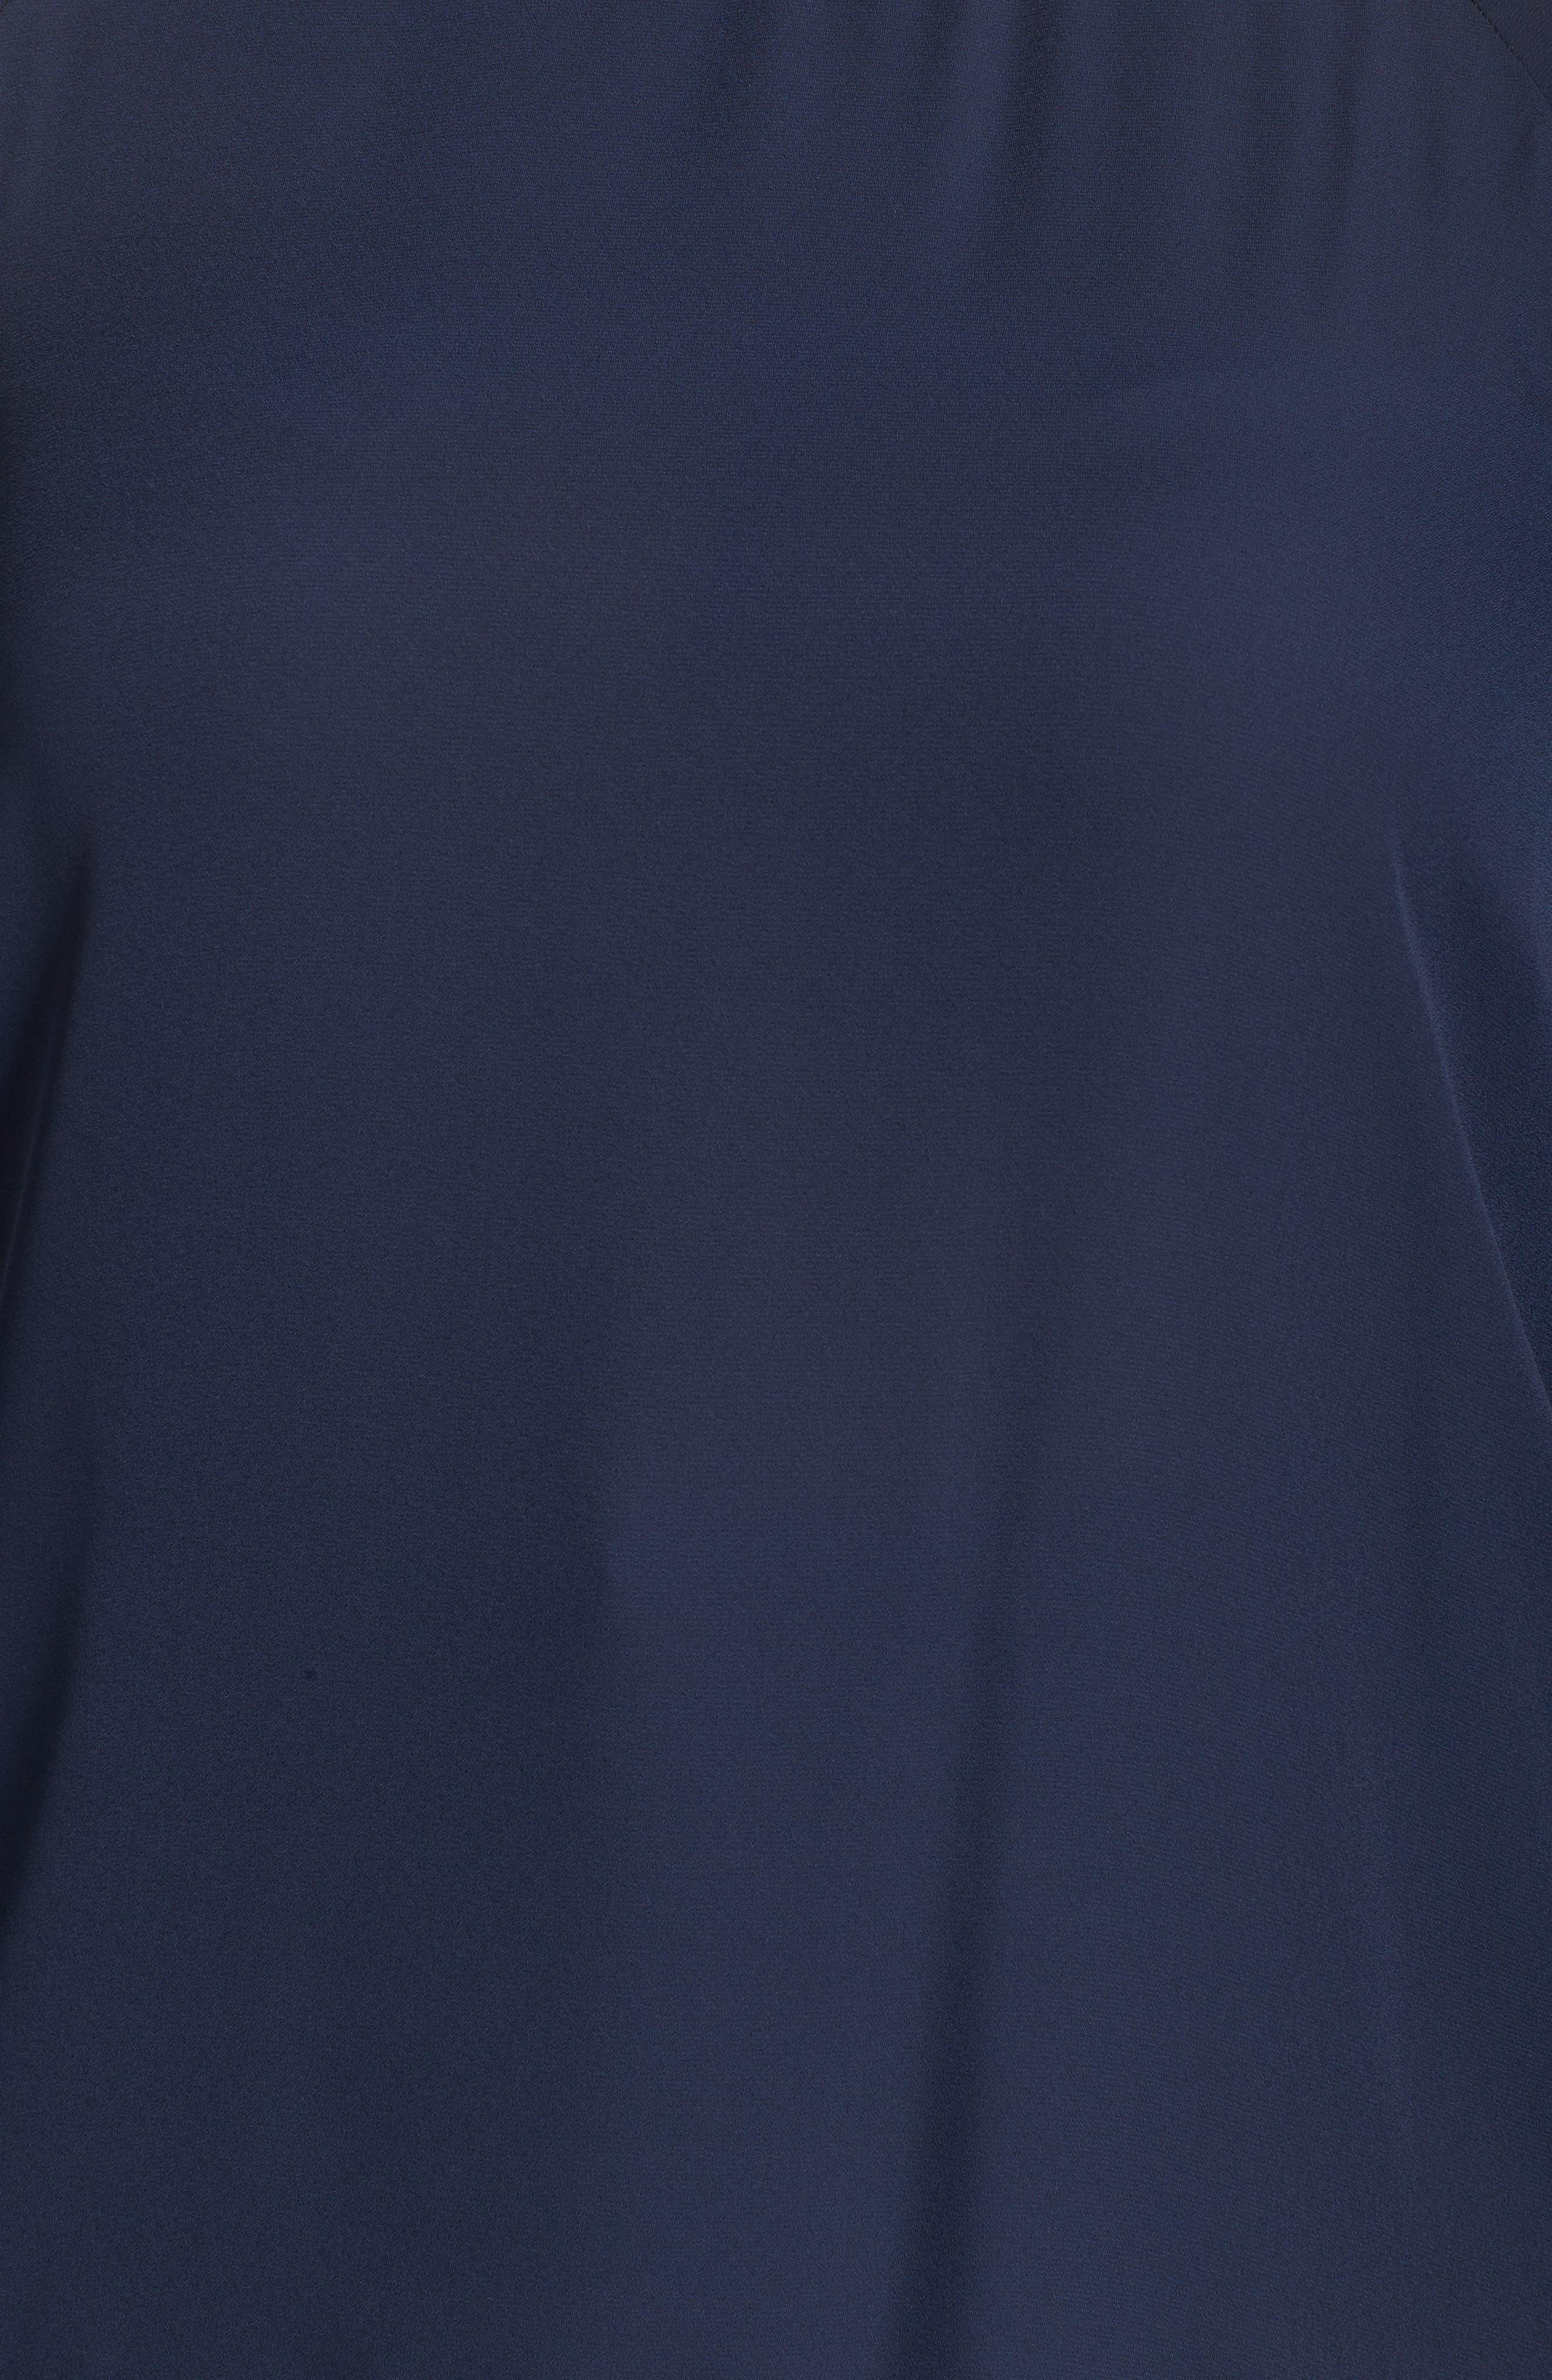 Ruffle Bell Sleeve Blouse,                             Alternate thumbnail 10, color,